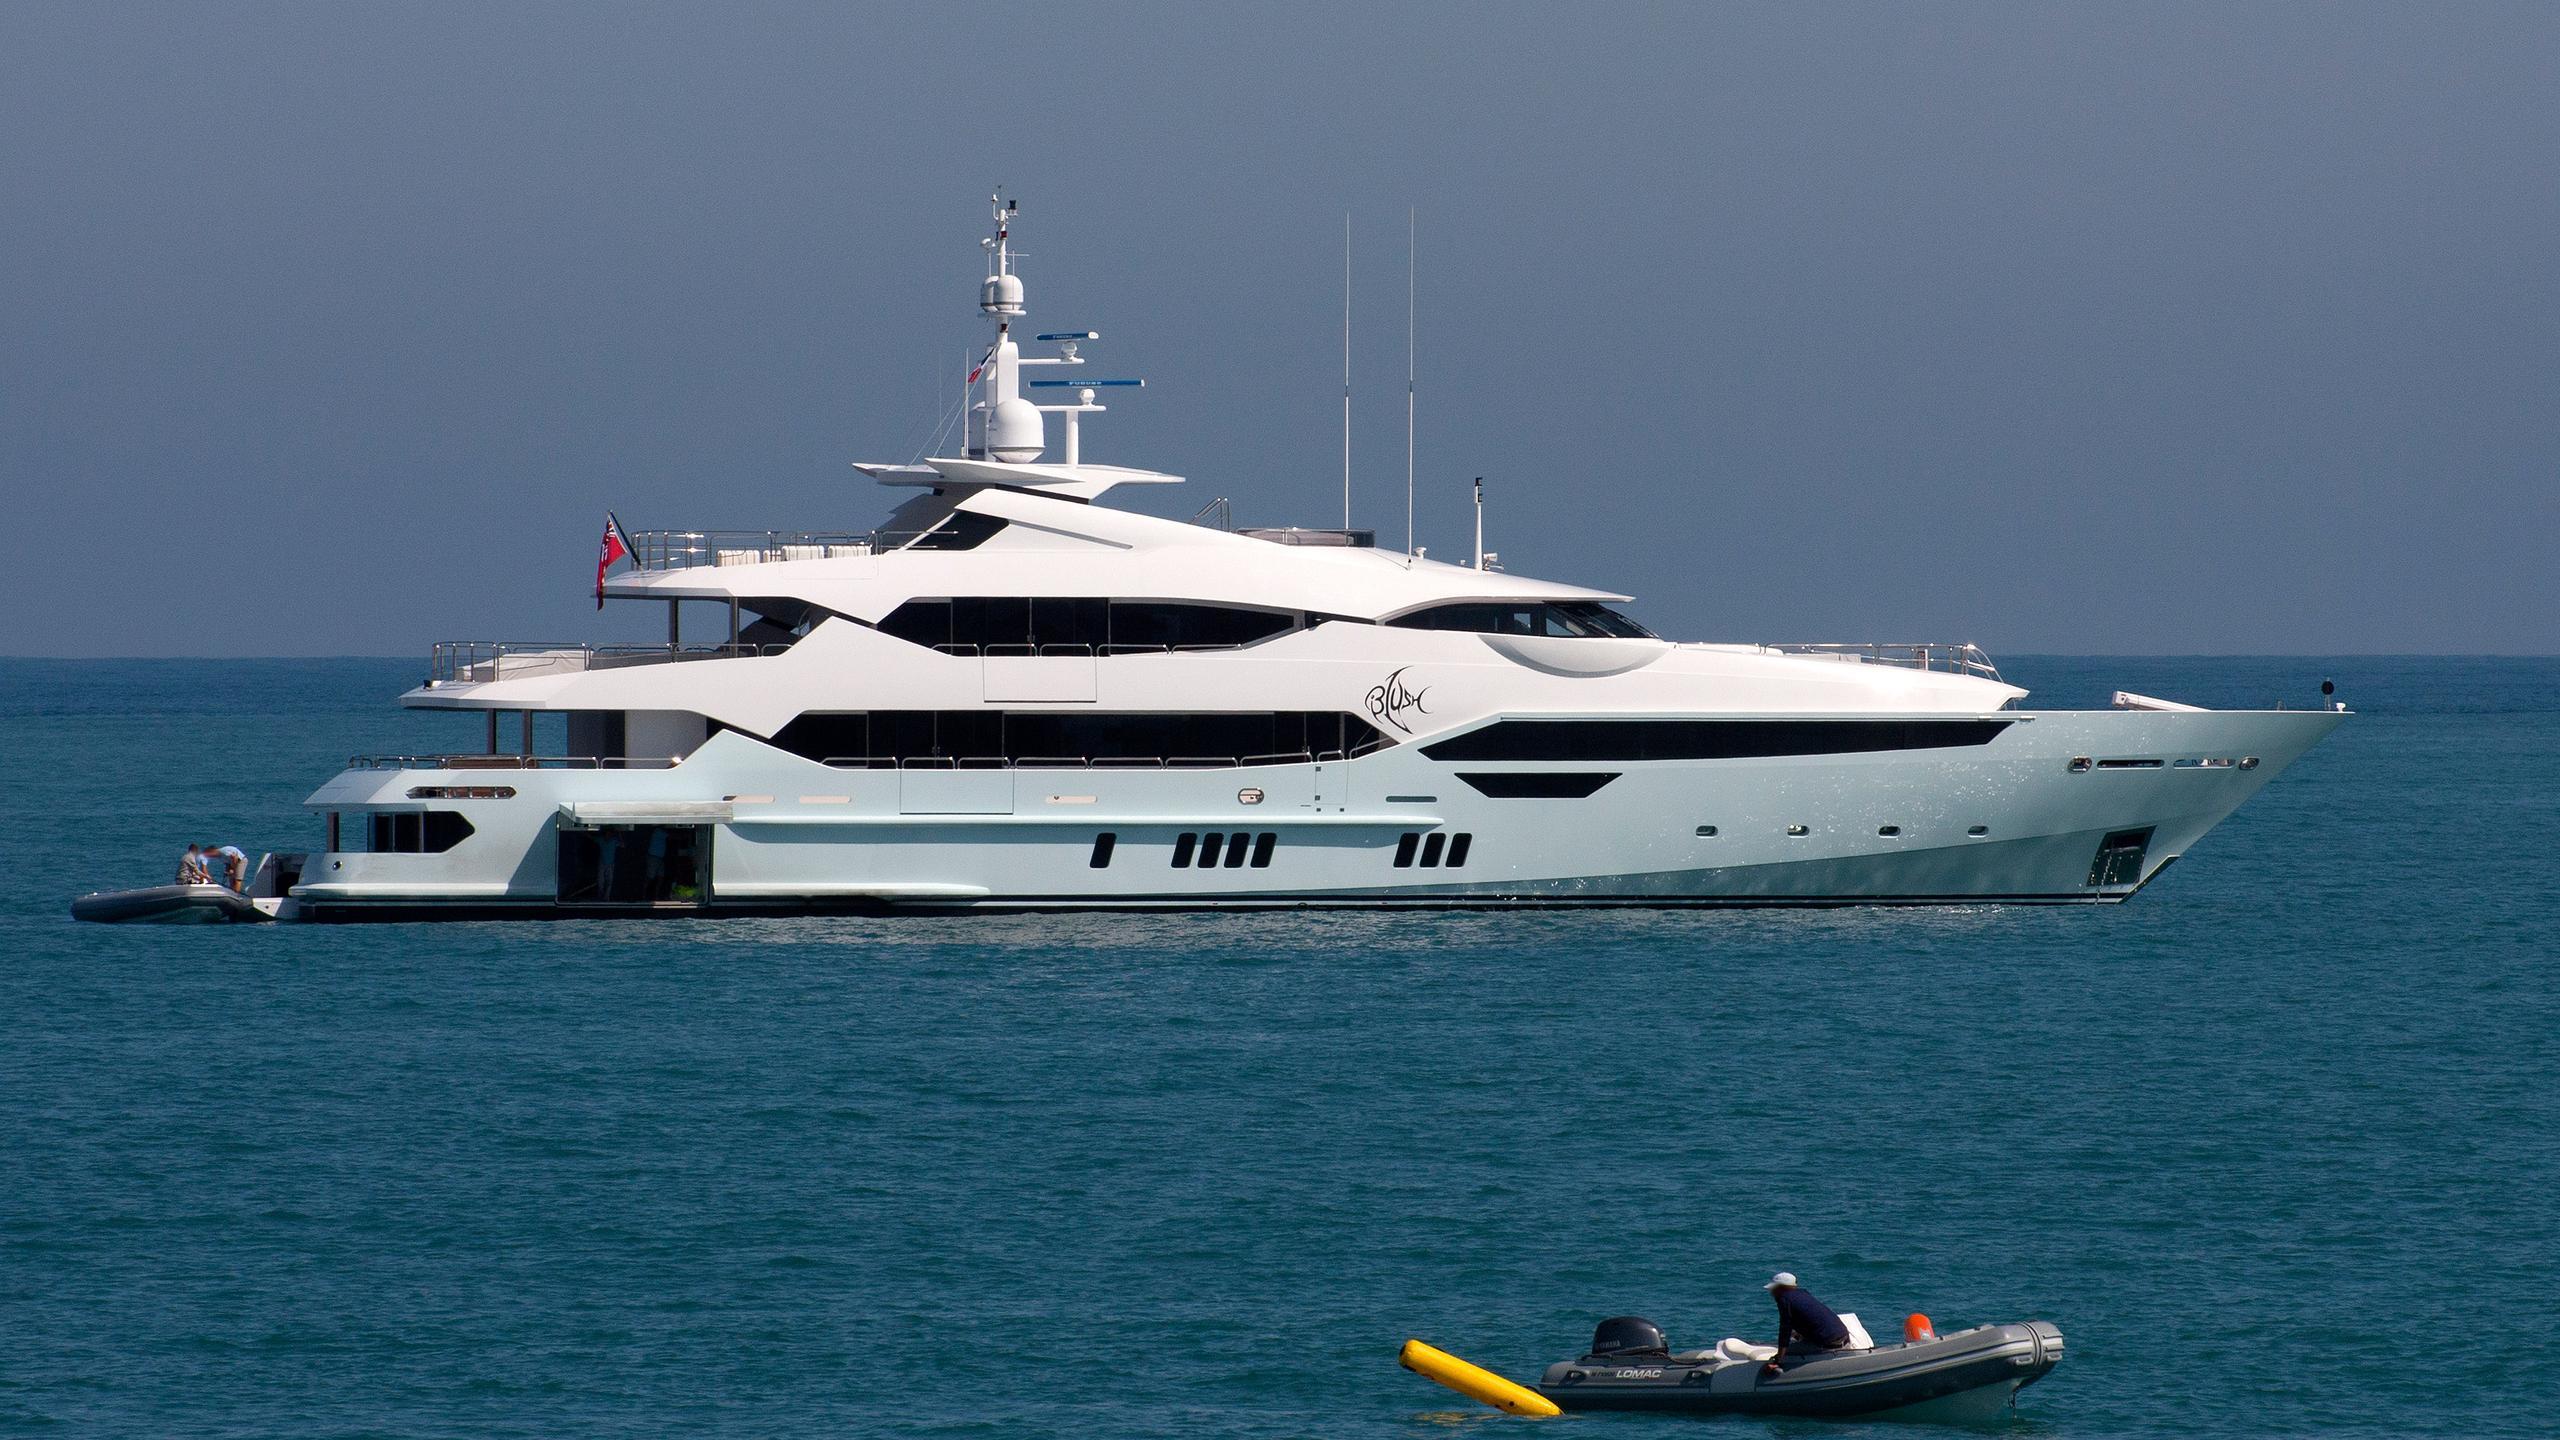 arados-blush-motor-yacht-sunseeker-2014-47m-profile-moored